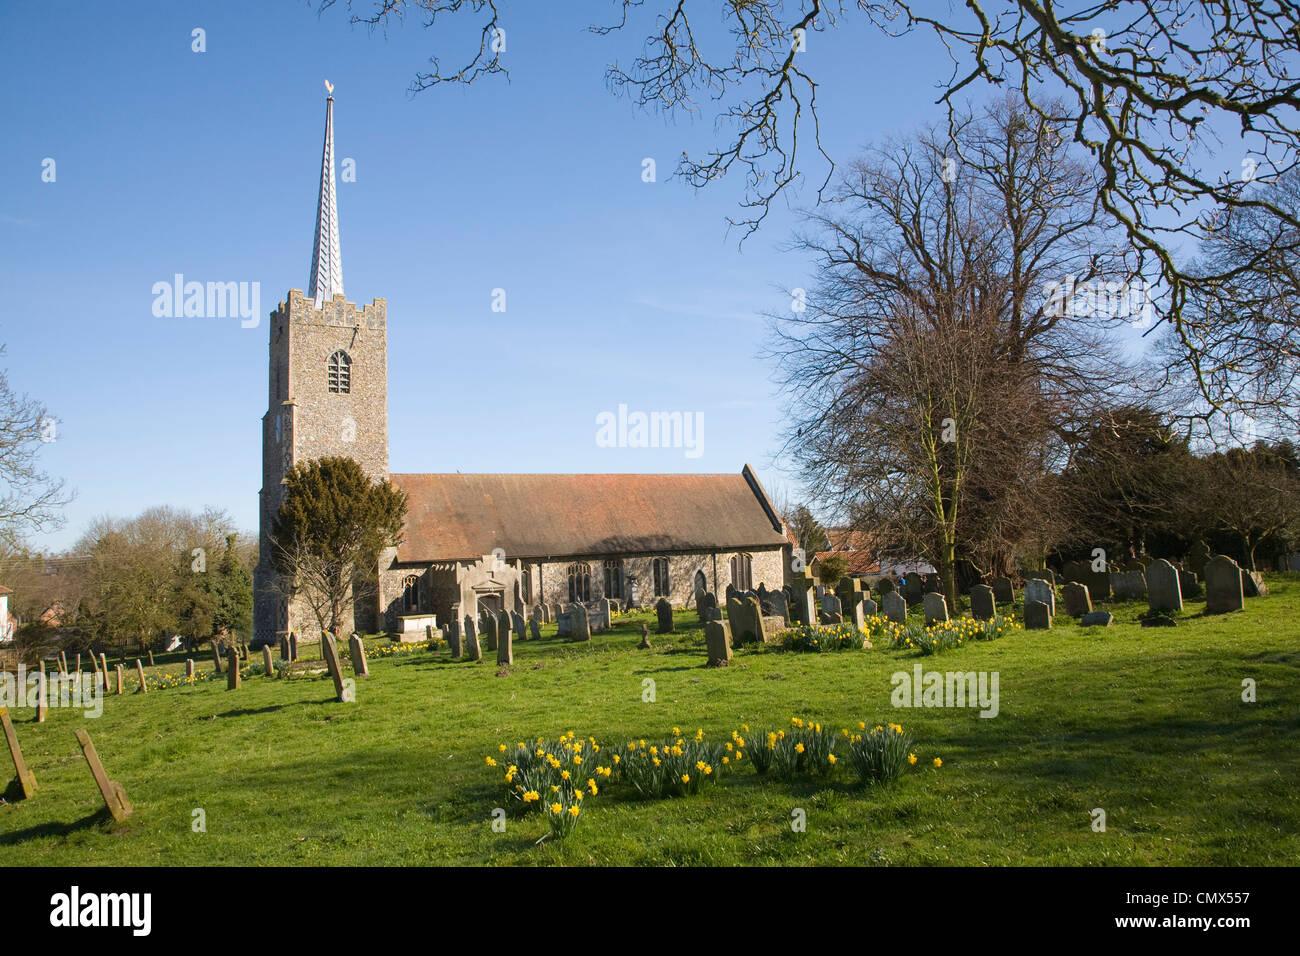 Holy Trinity village parish church, Middleton, Suffolk, England Stock Photo